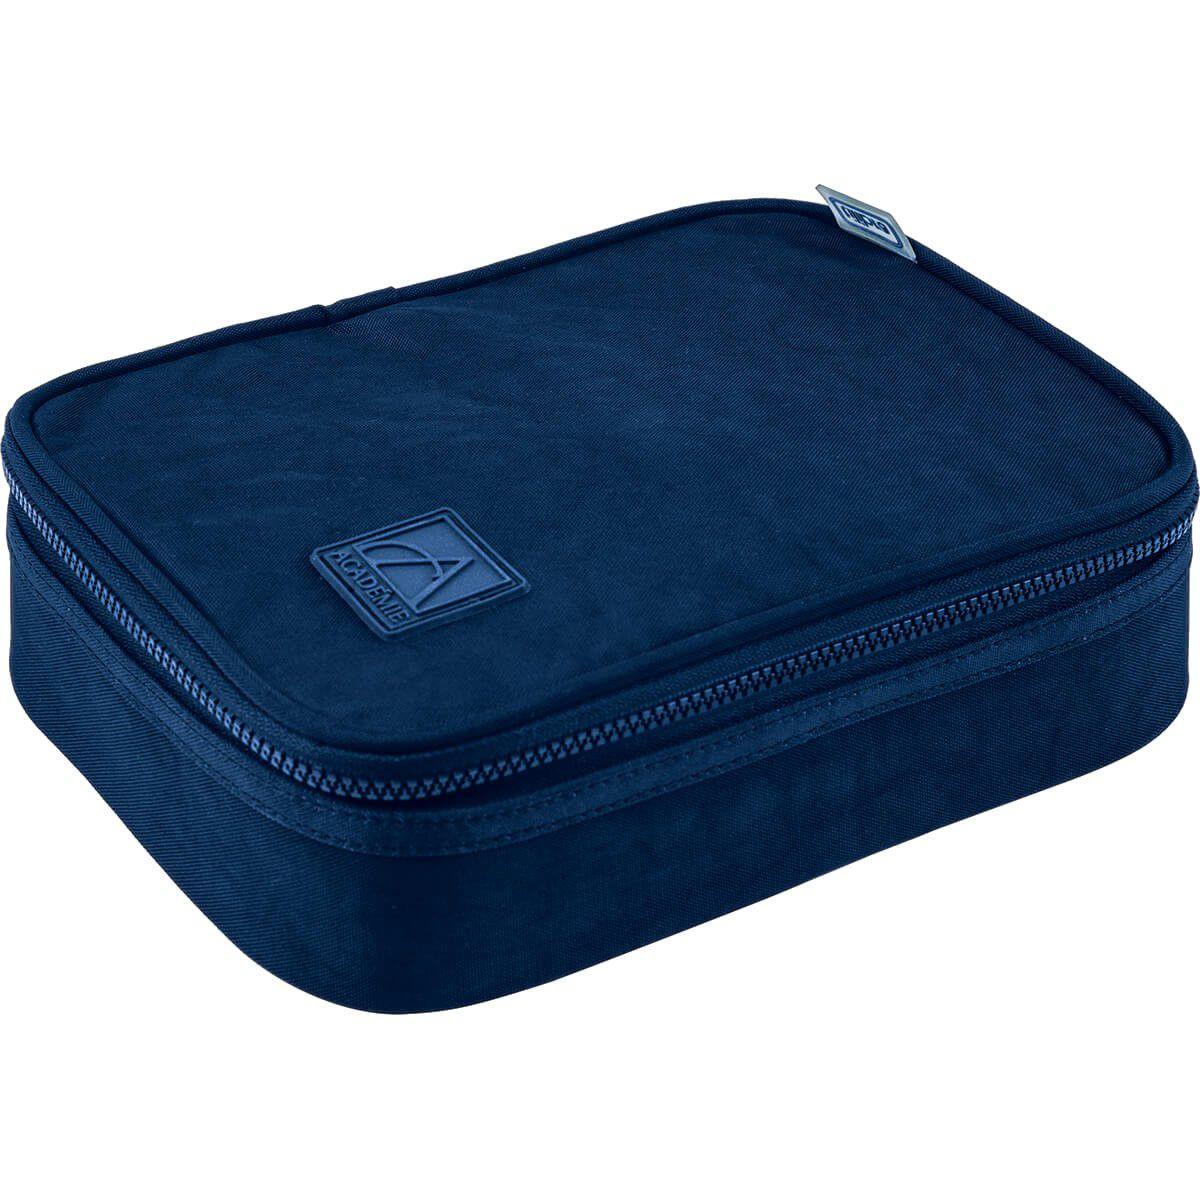 Estojo escolar box azul  ACADÉMIE Tilibra